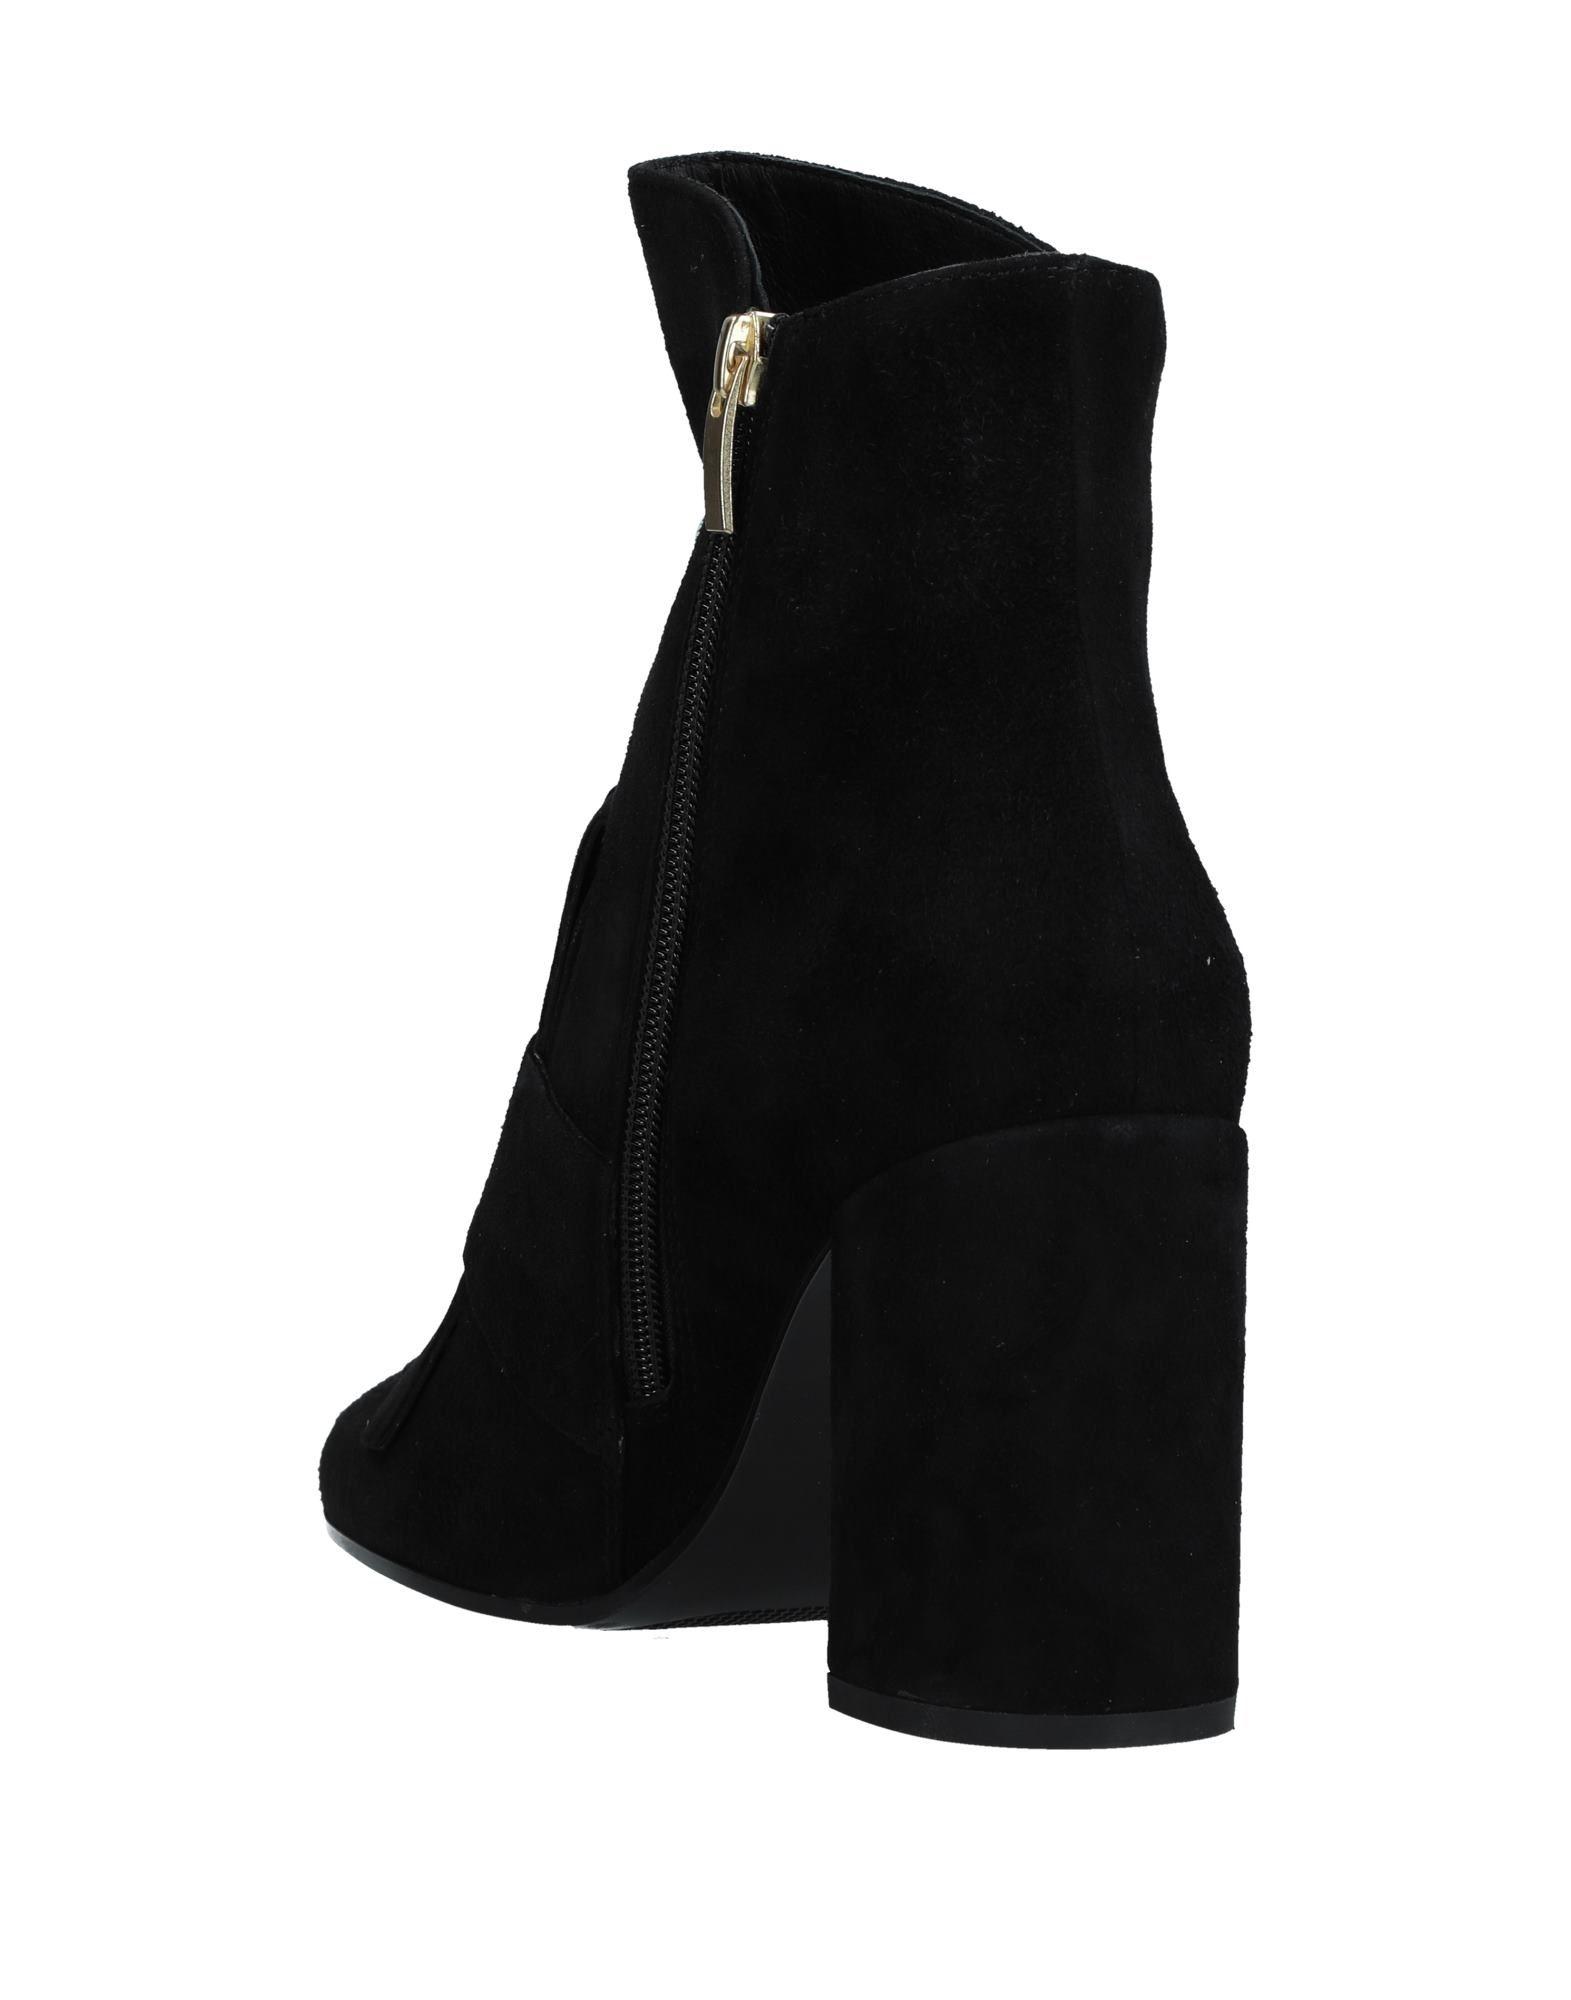 Gut um Premi billige Schuhe zu tragenBruno Premi um Stiefelette Damen  11534036GR 57f521